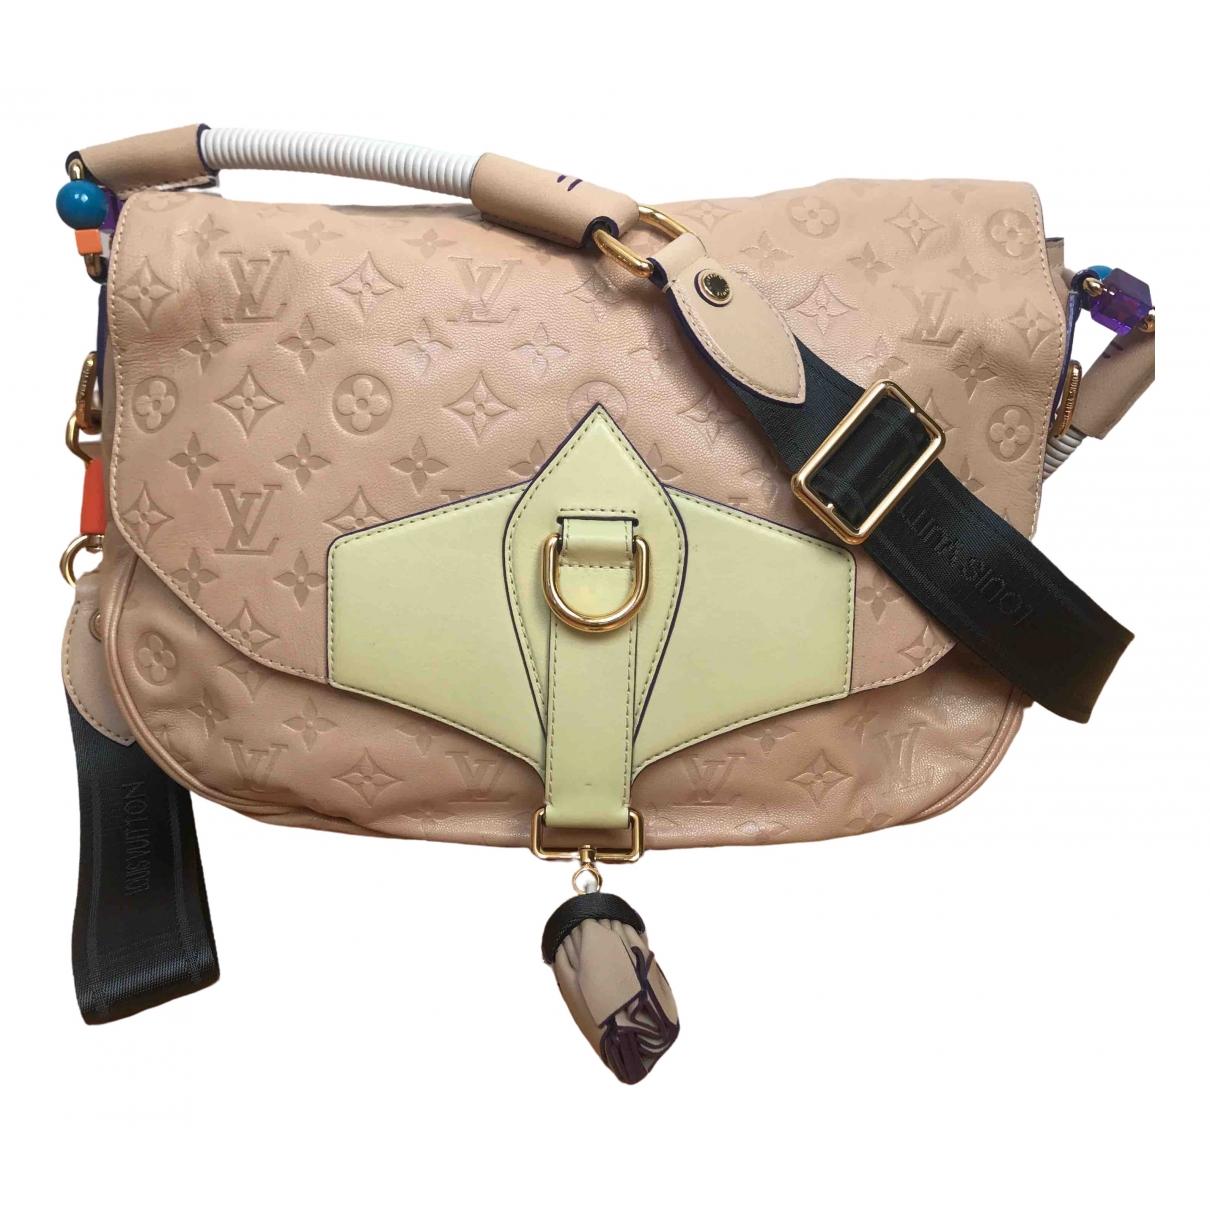 Louis Vuitton \N Beige Leather handbag for Women \N